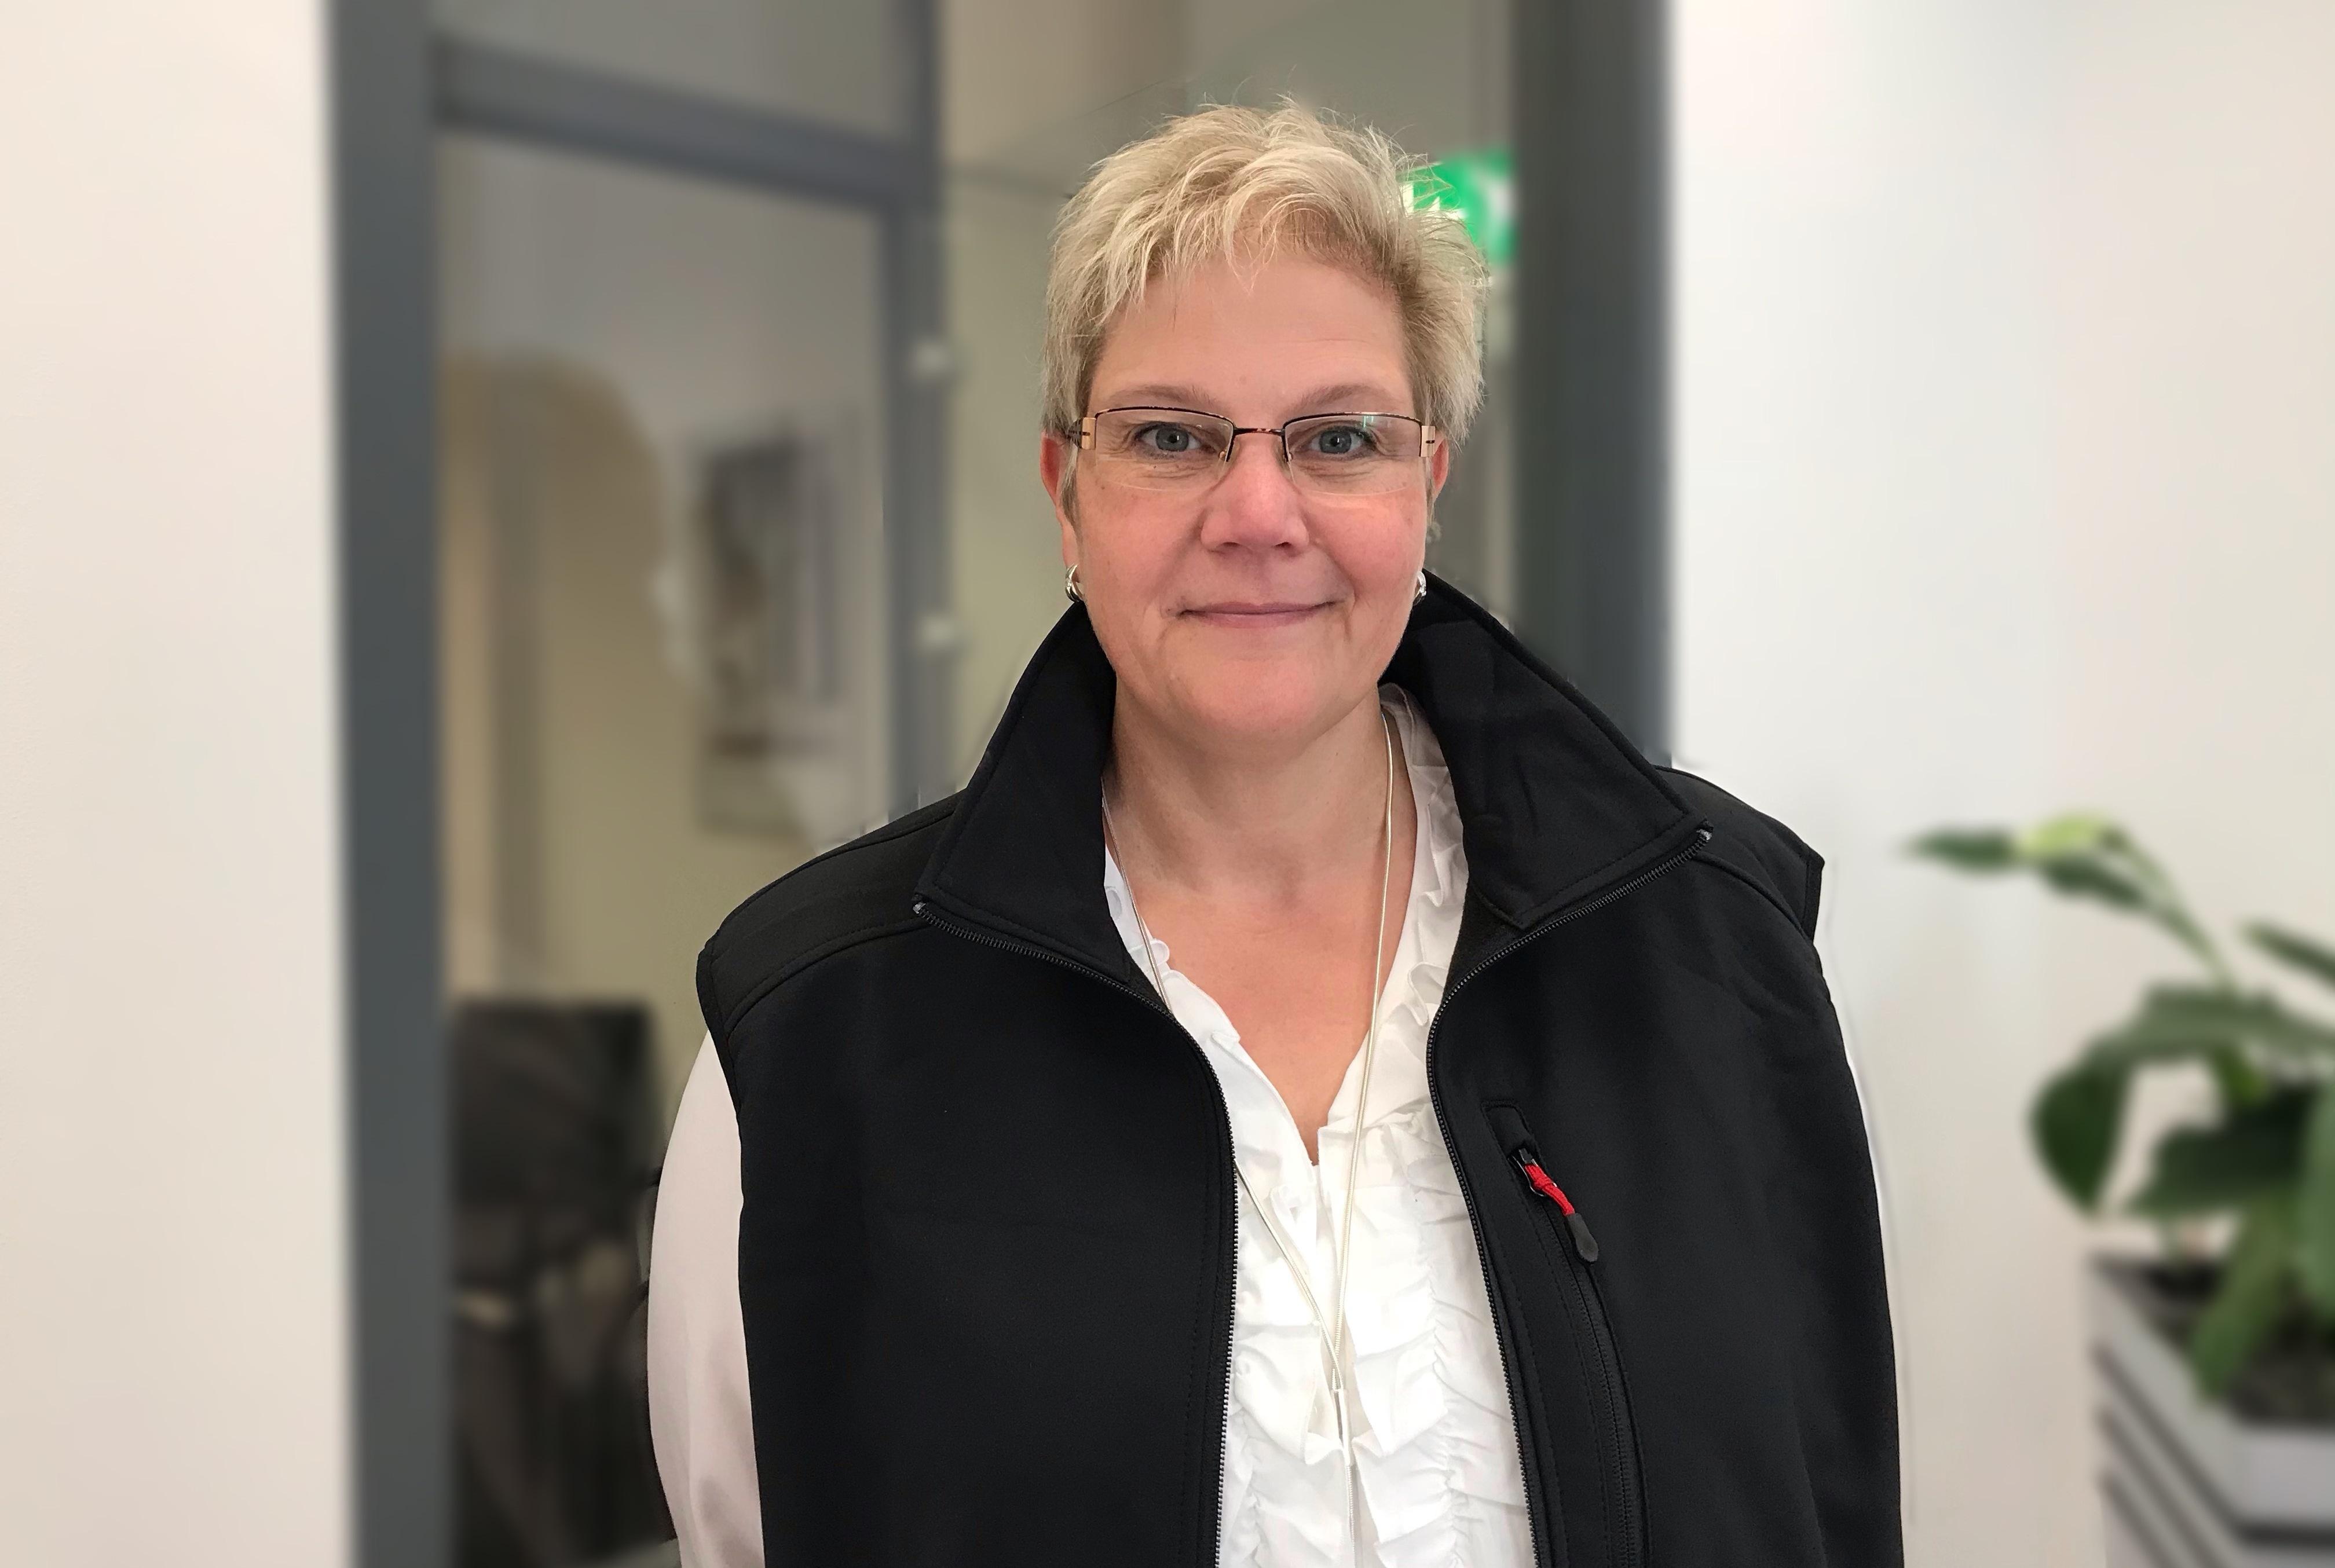 Susann Krüger